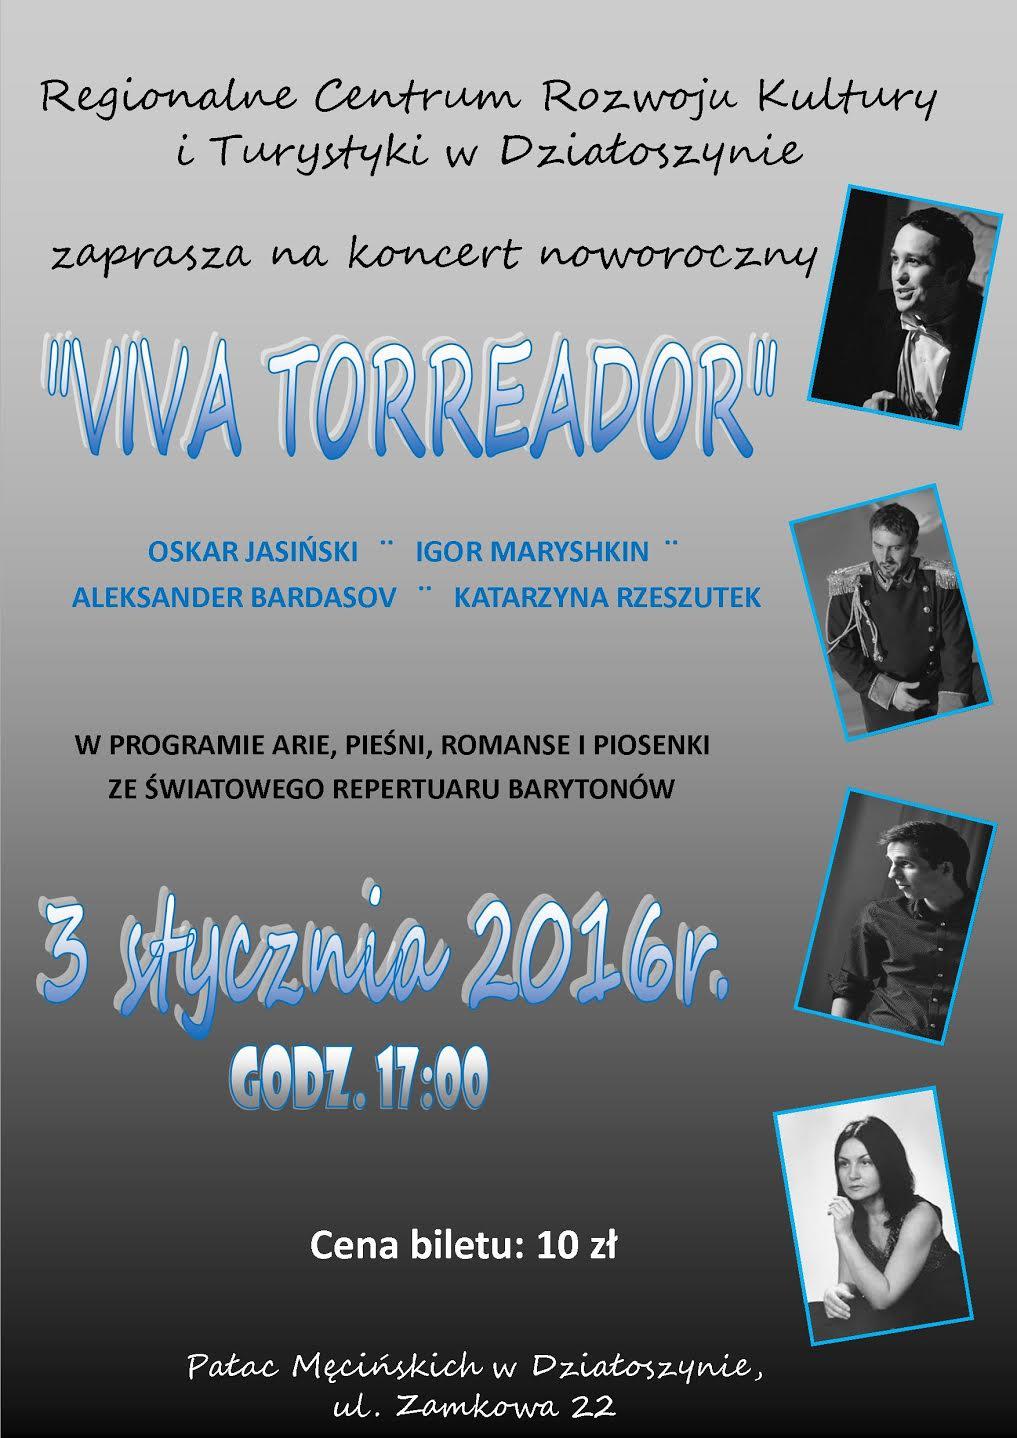 viva torreador koncert dzialoszyn